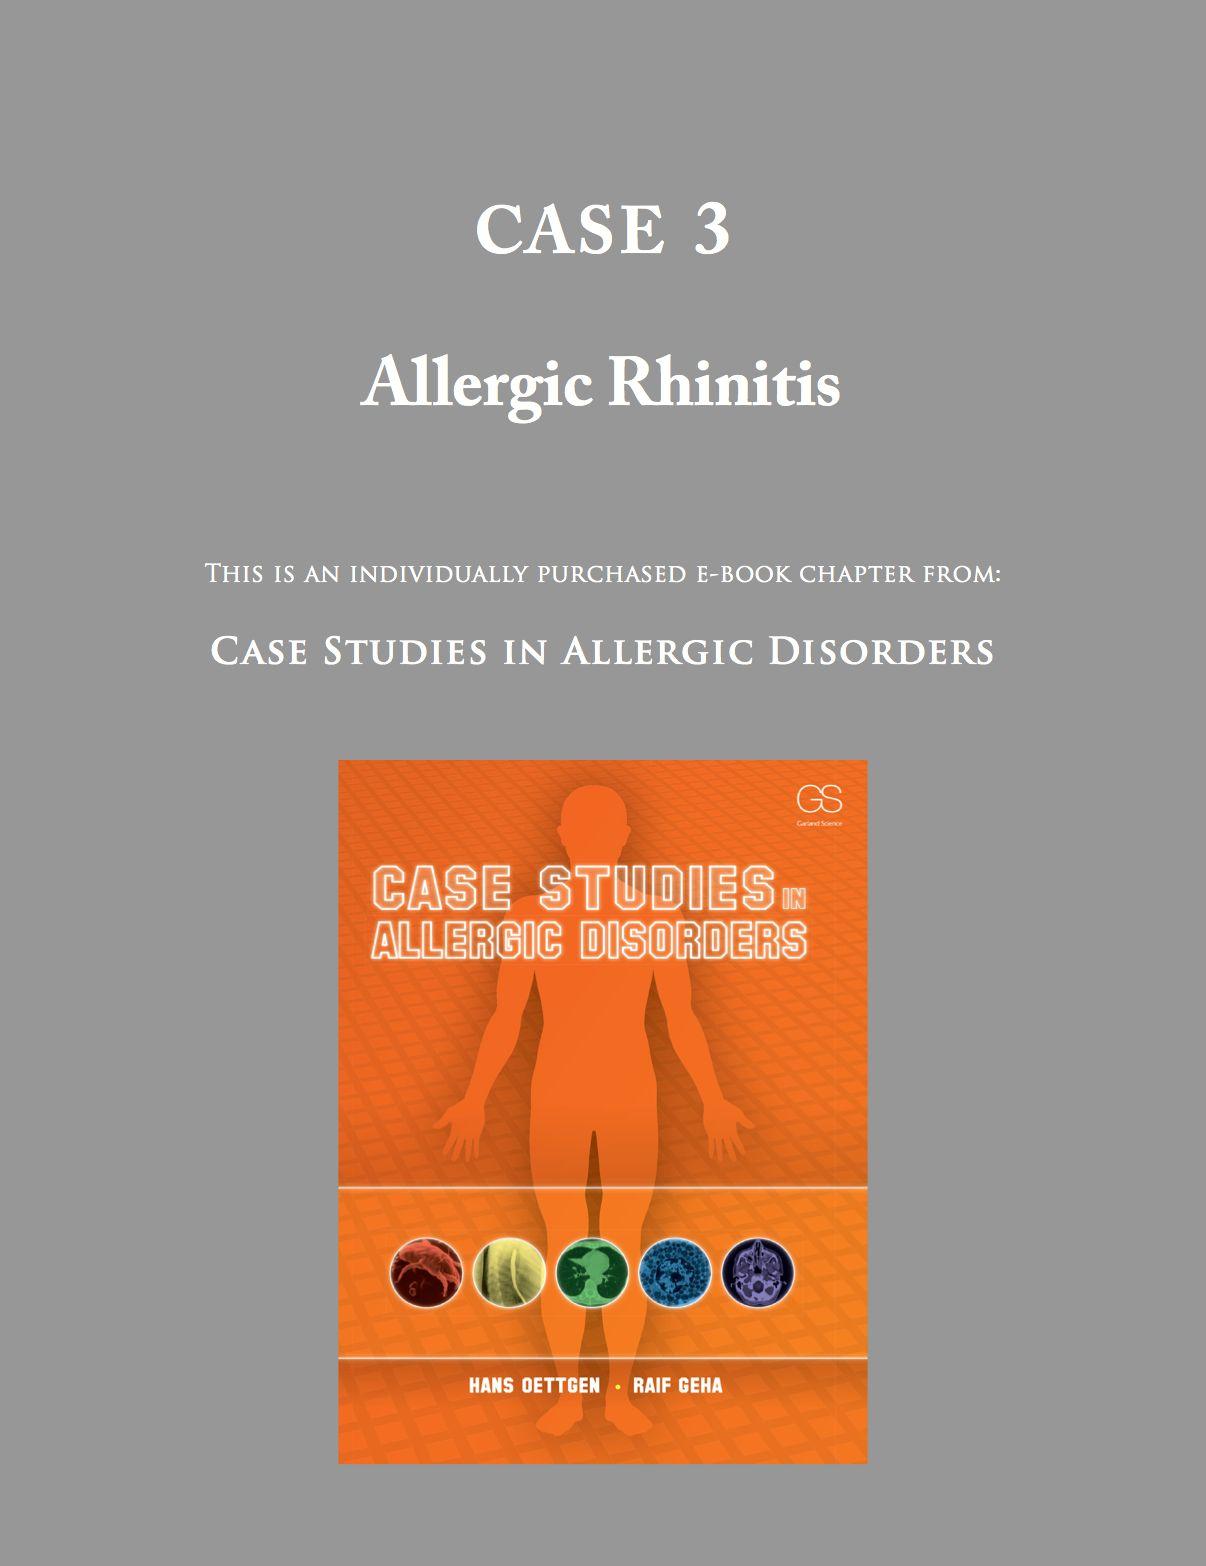 Allergy - Wikipedia